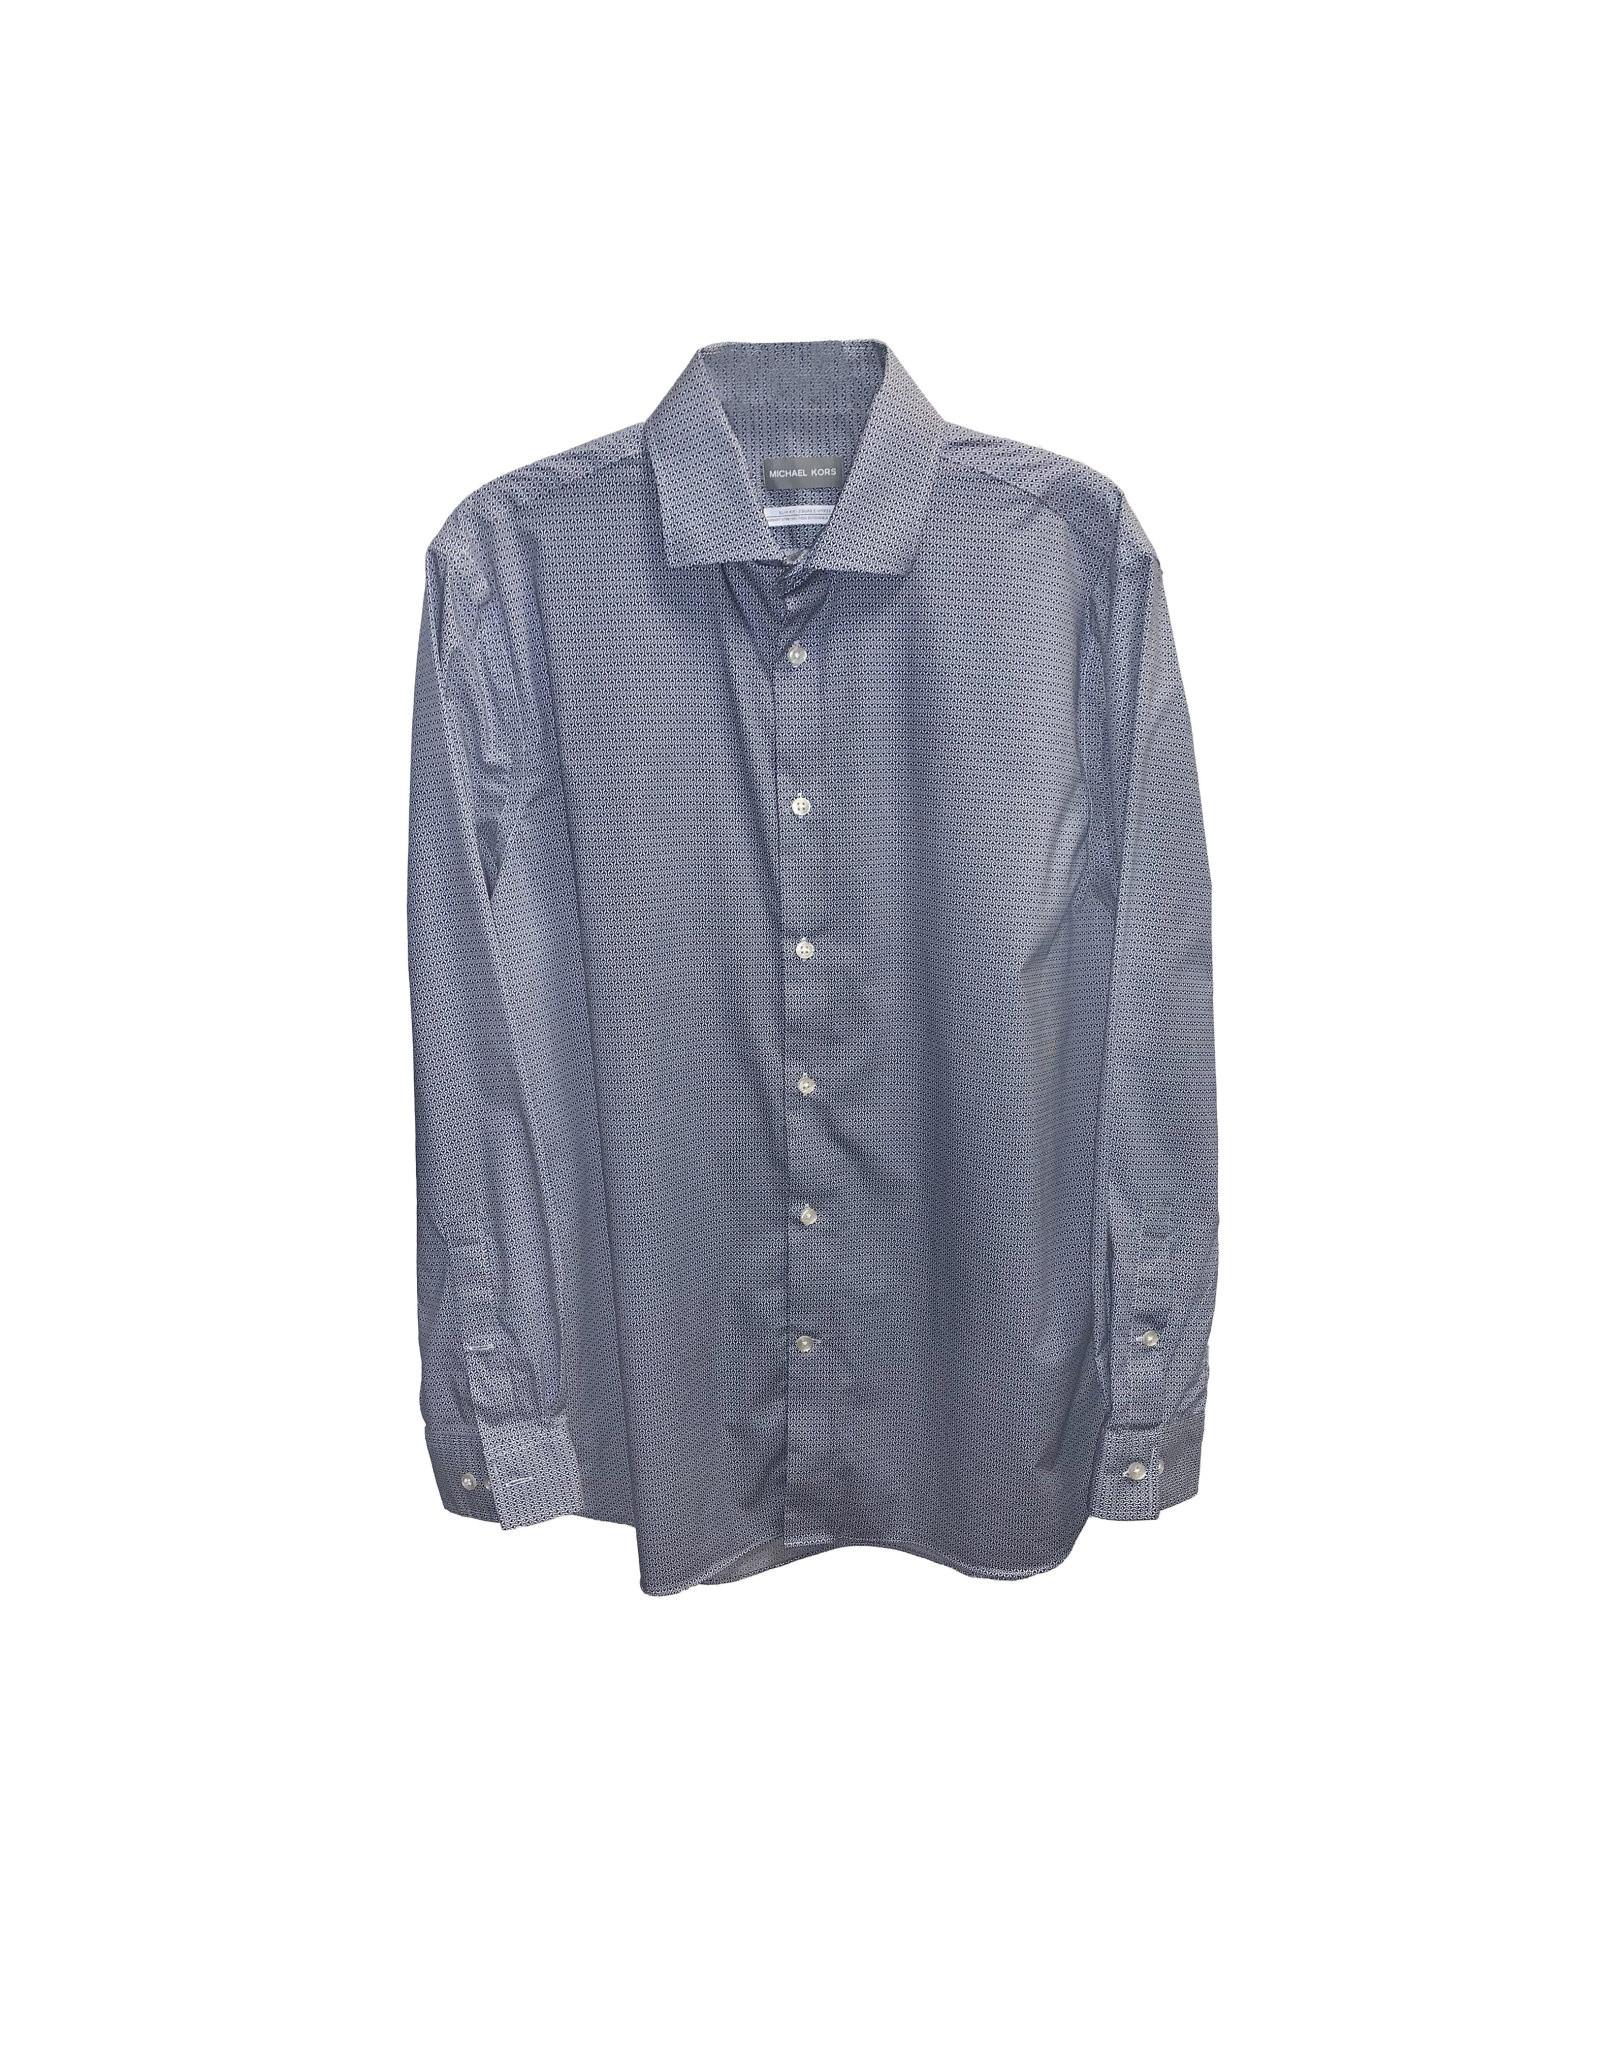 Michael Kors MICHAEL KORS  Slim Fit  Dress Shirt Size 16